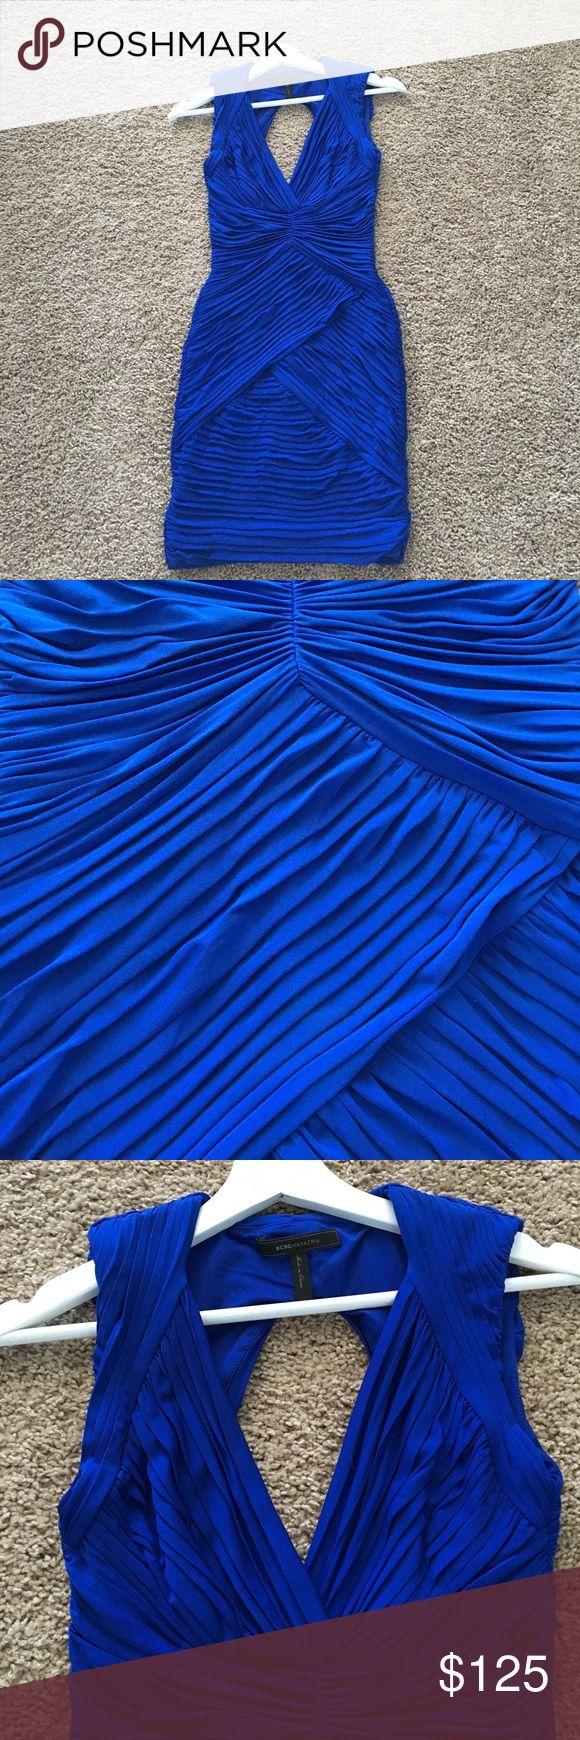 17 Best Ideas About Electric Blue Weddings On Pinterest